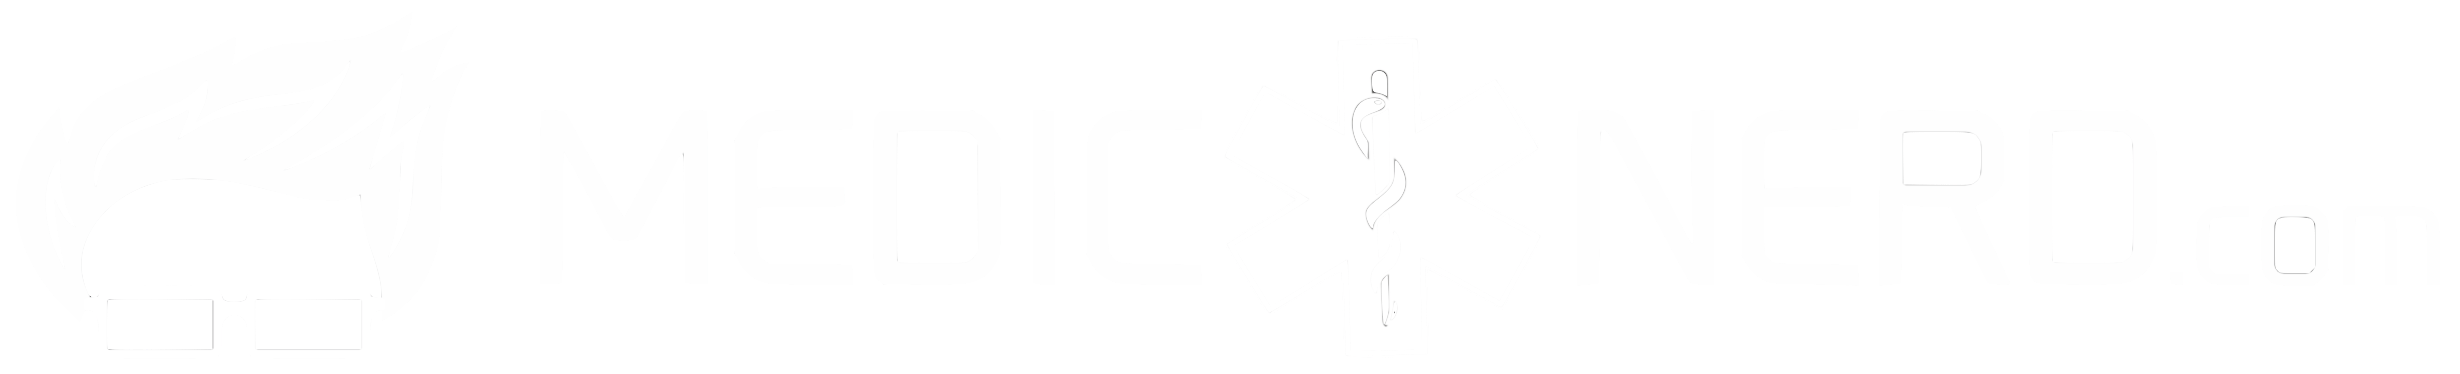 MedicNerd.com